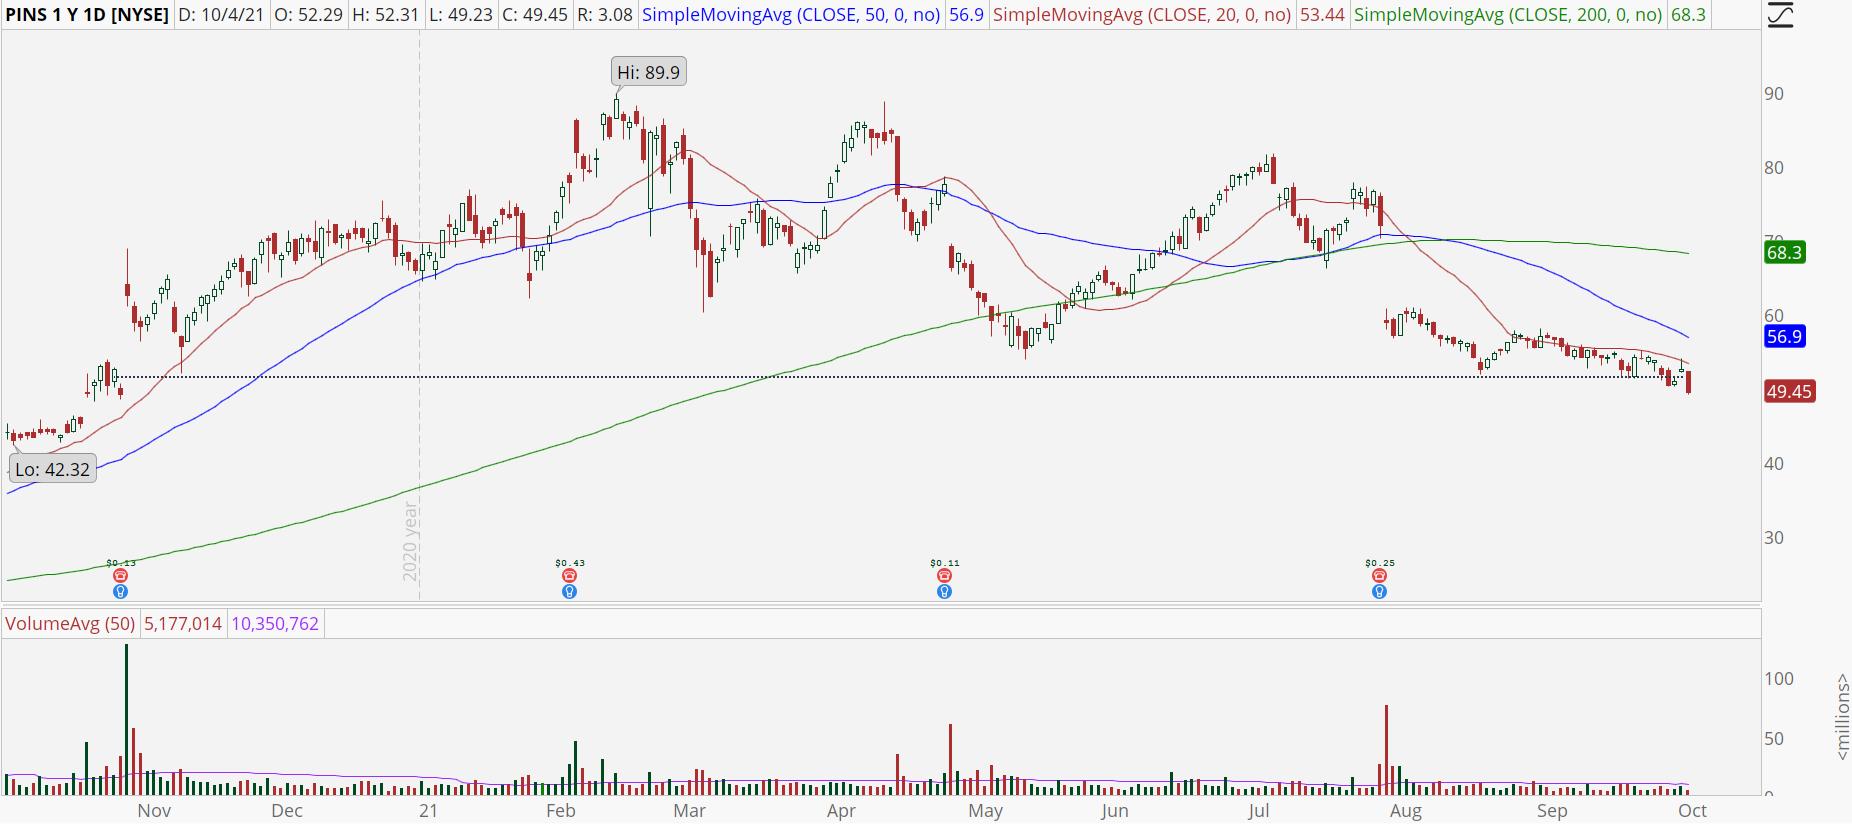 Pinterest (PINS) stock chart with bearish breakout